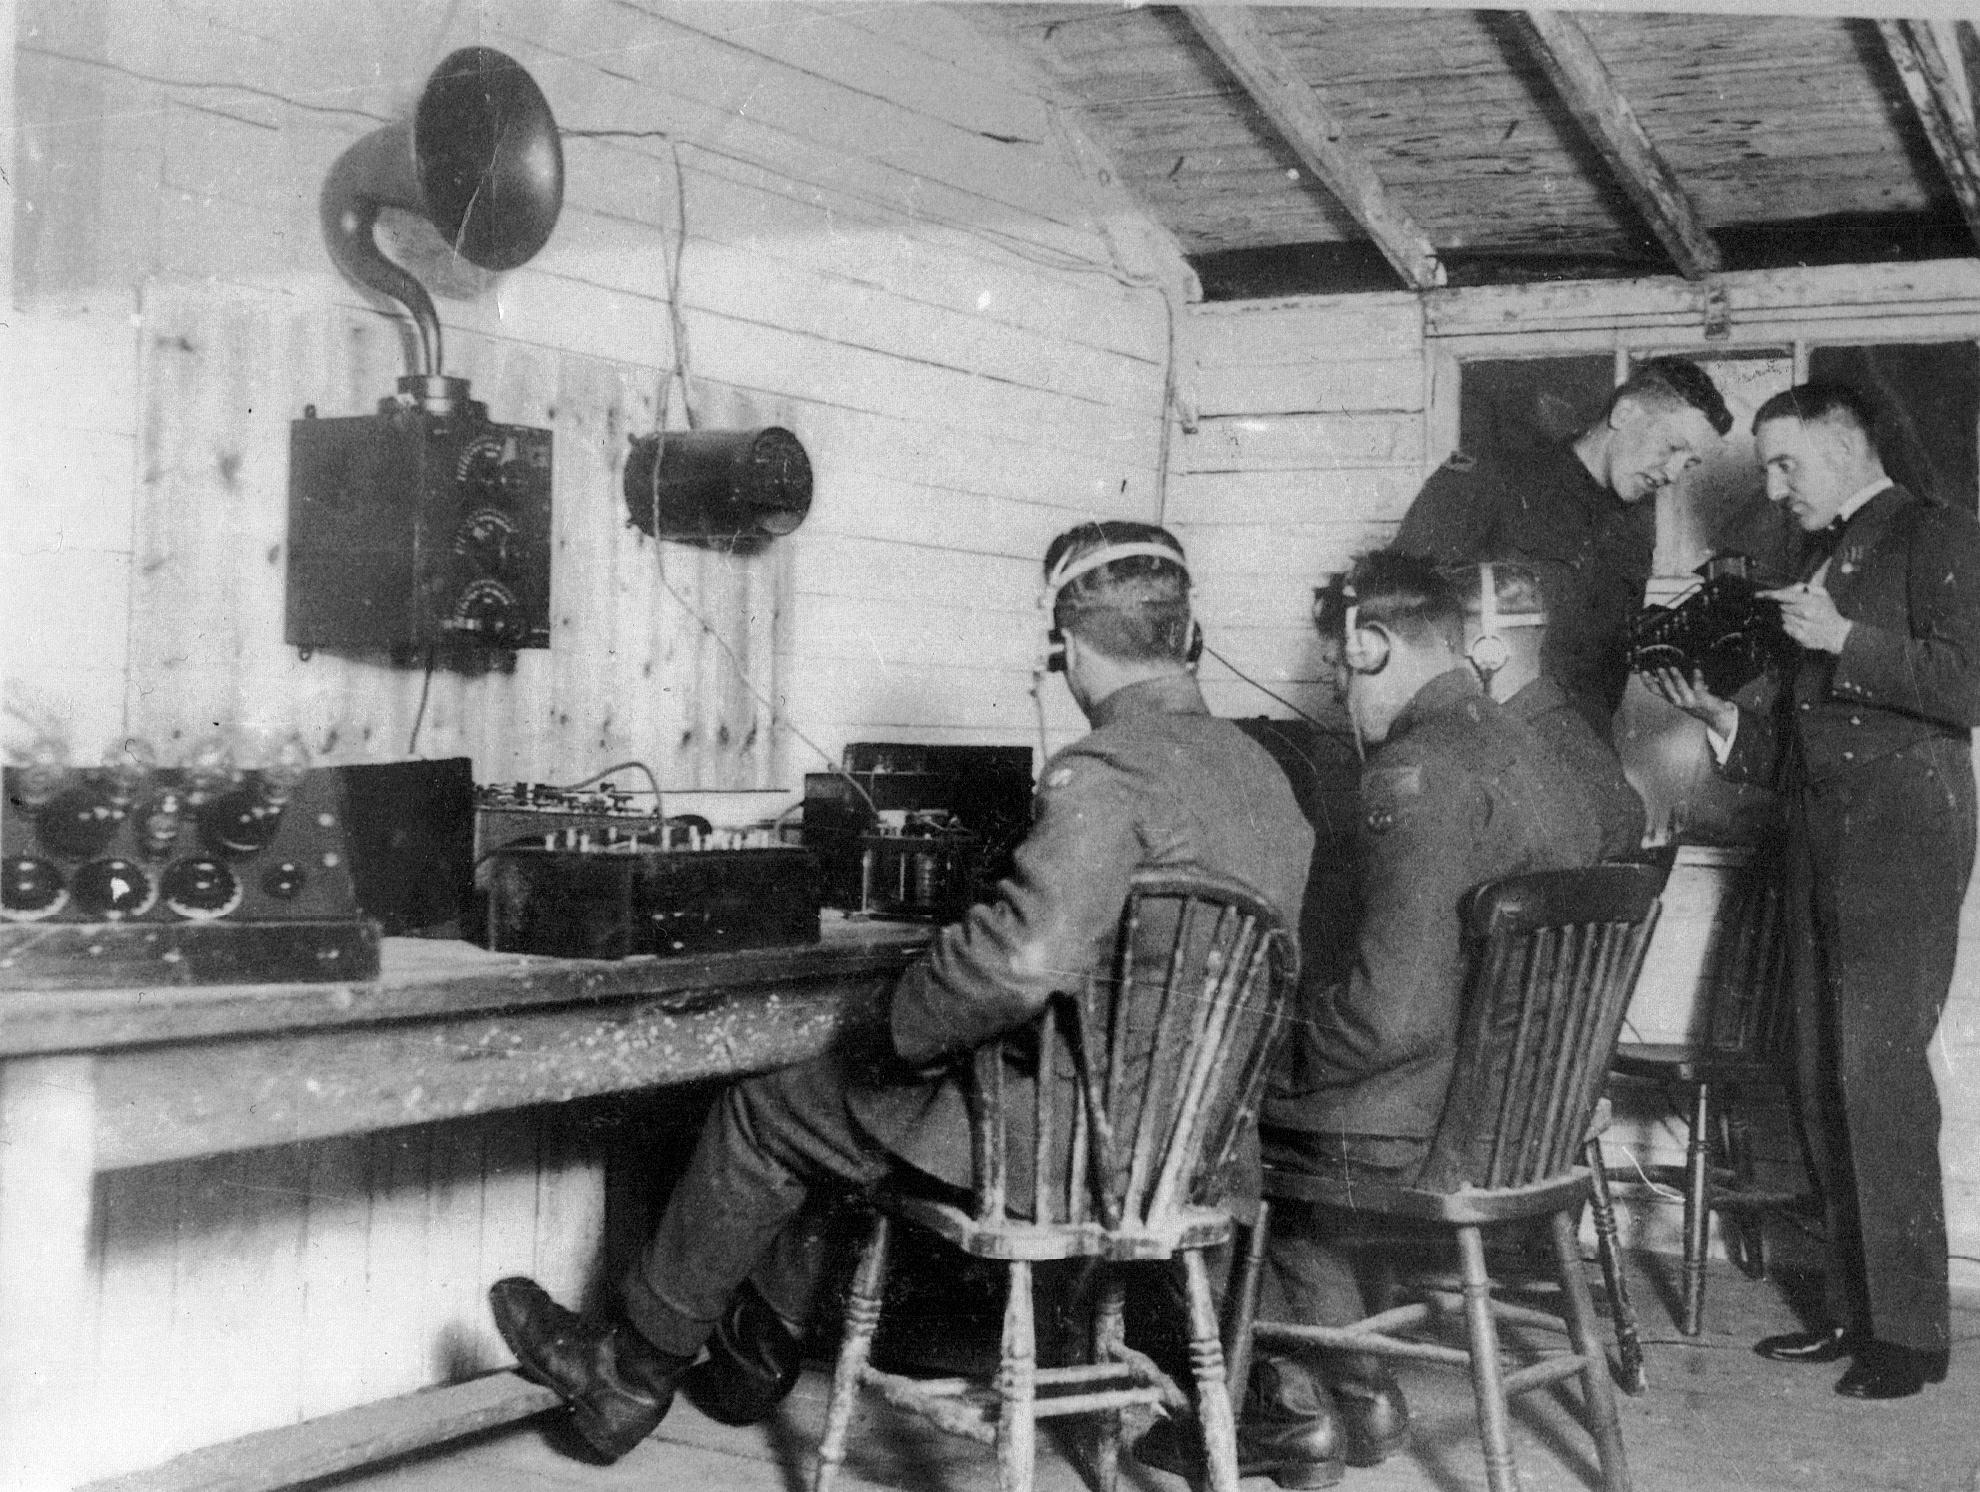 Wireless shack at Cranwell 1920ish